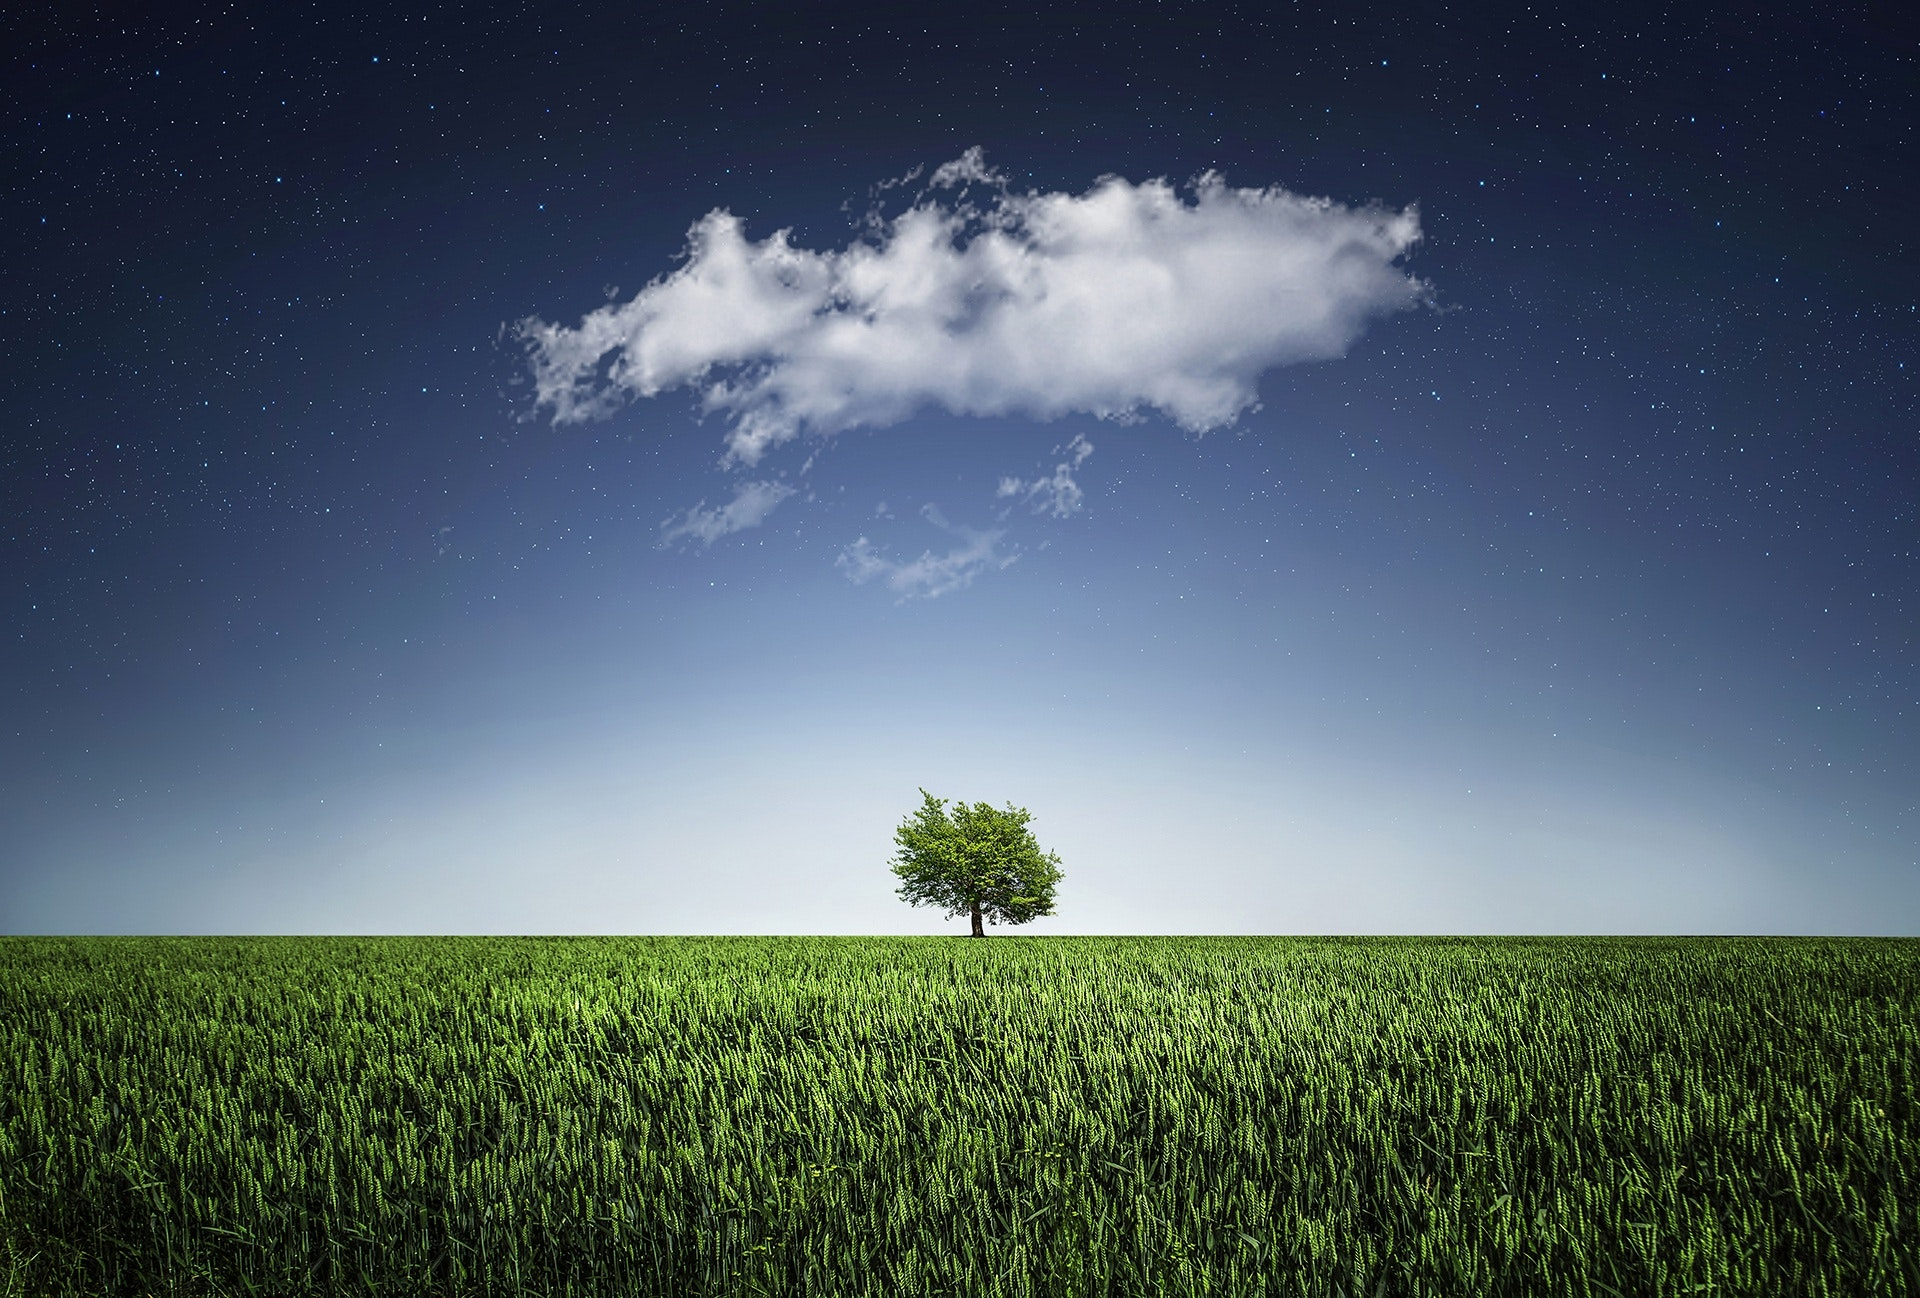 cloud-countryside-field-36767.jpg